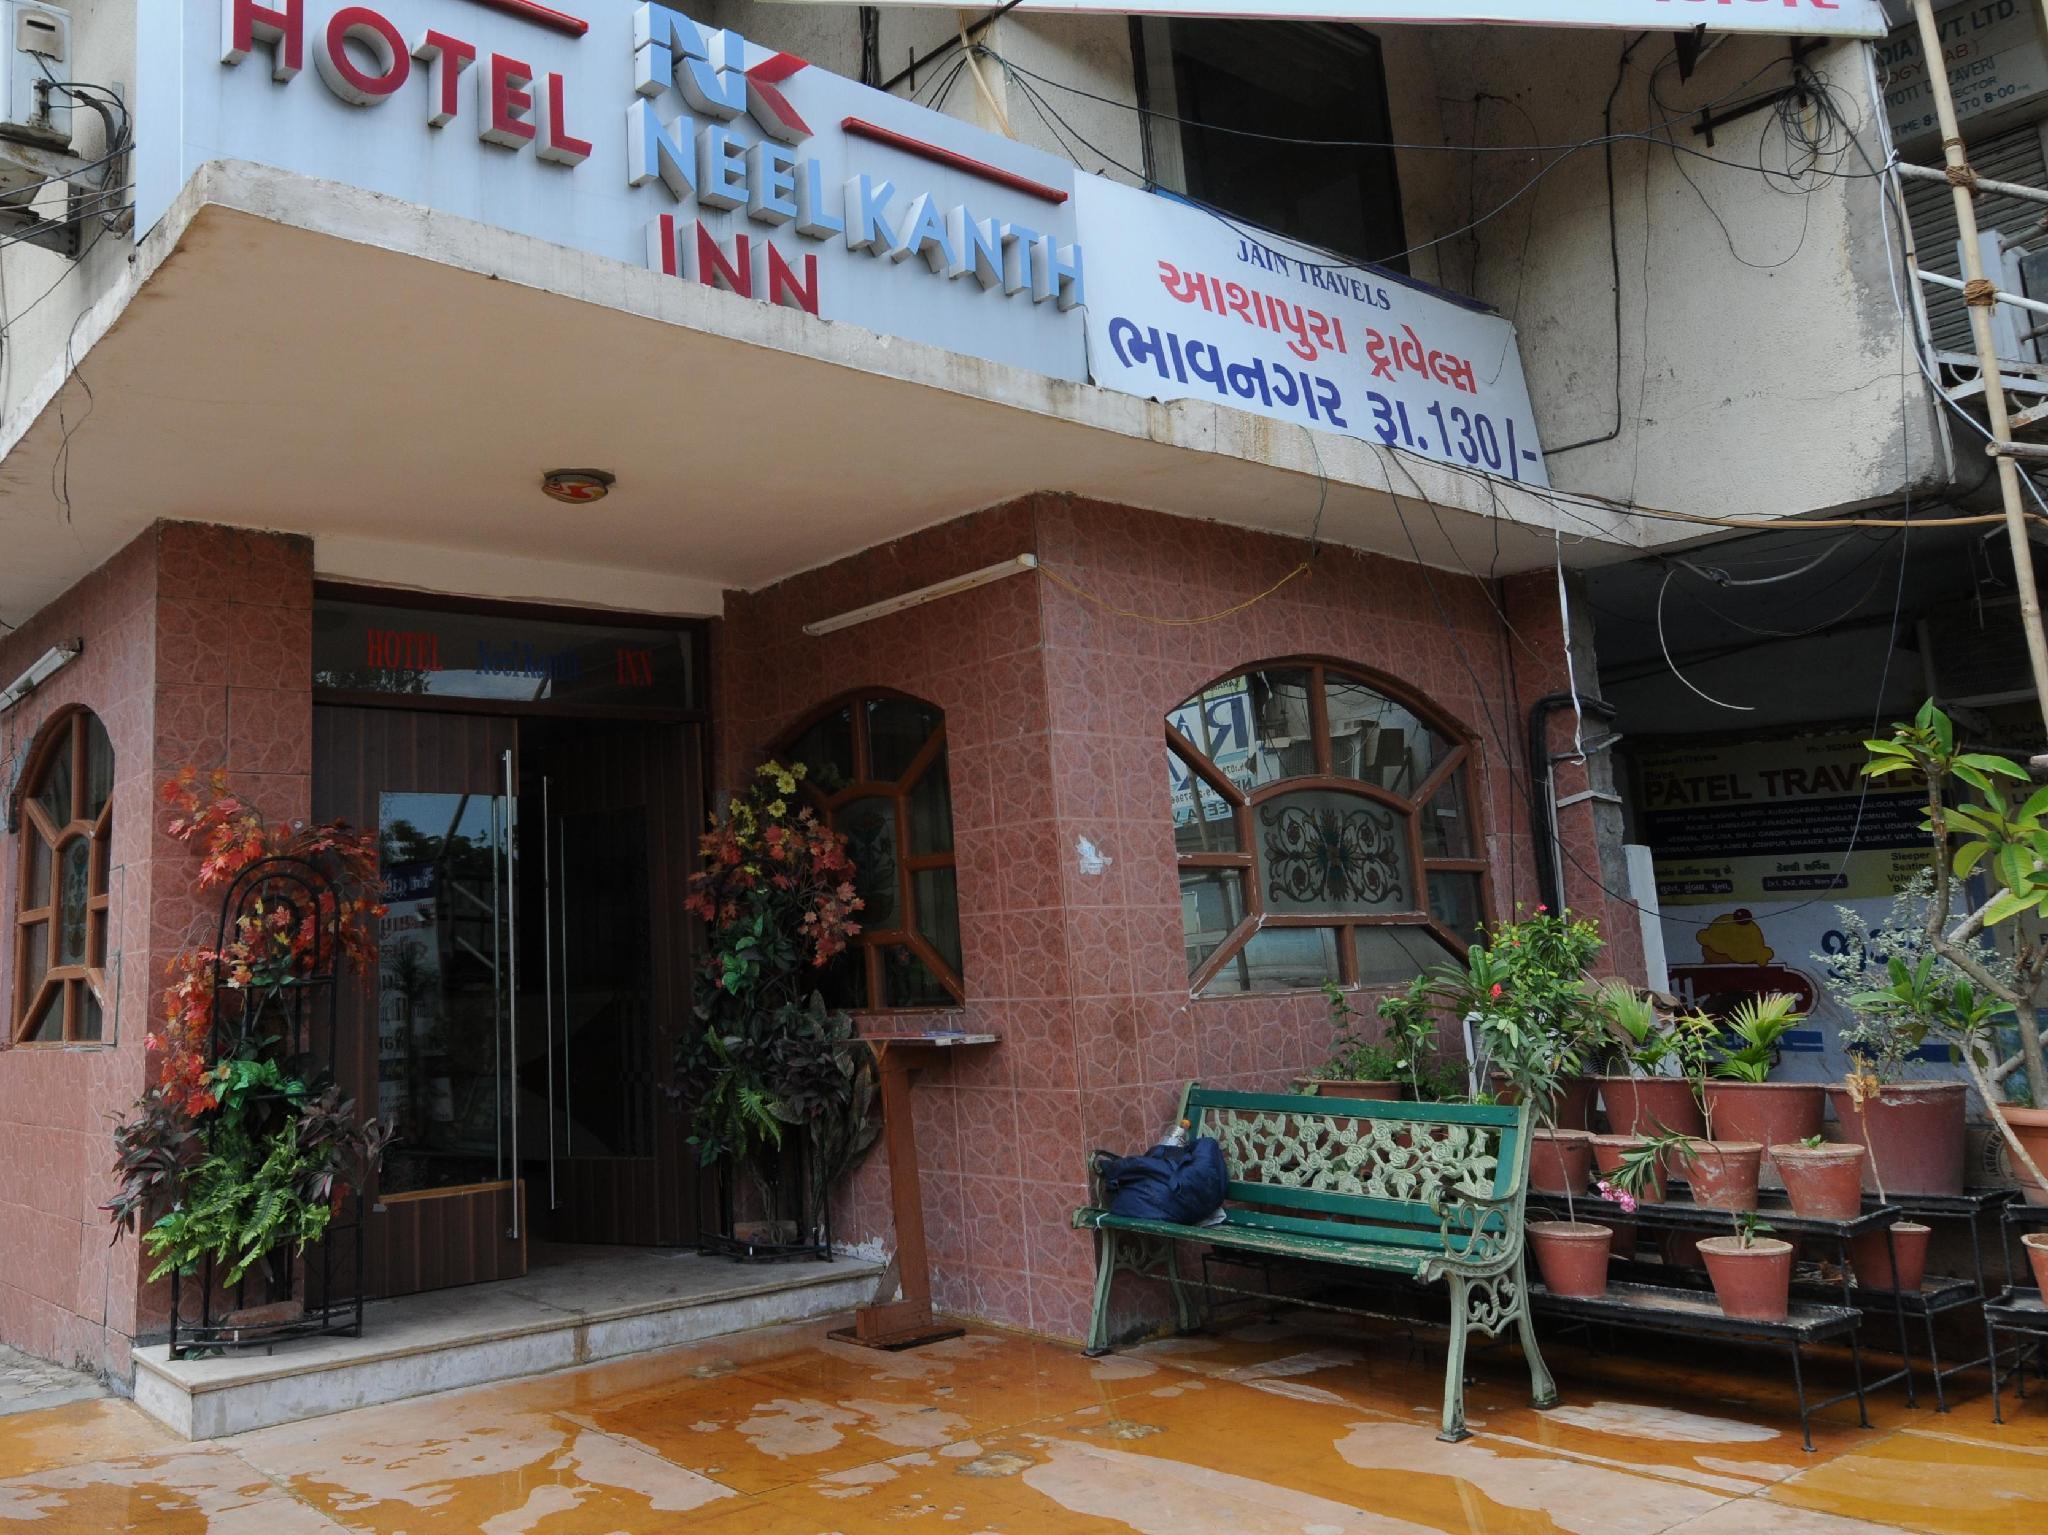 Hotel Neelkanth-Inn, Ahmadabad